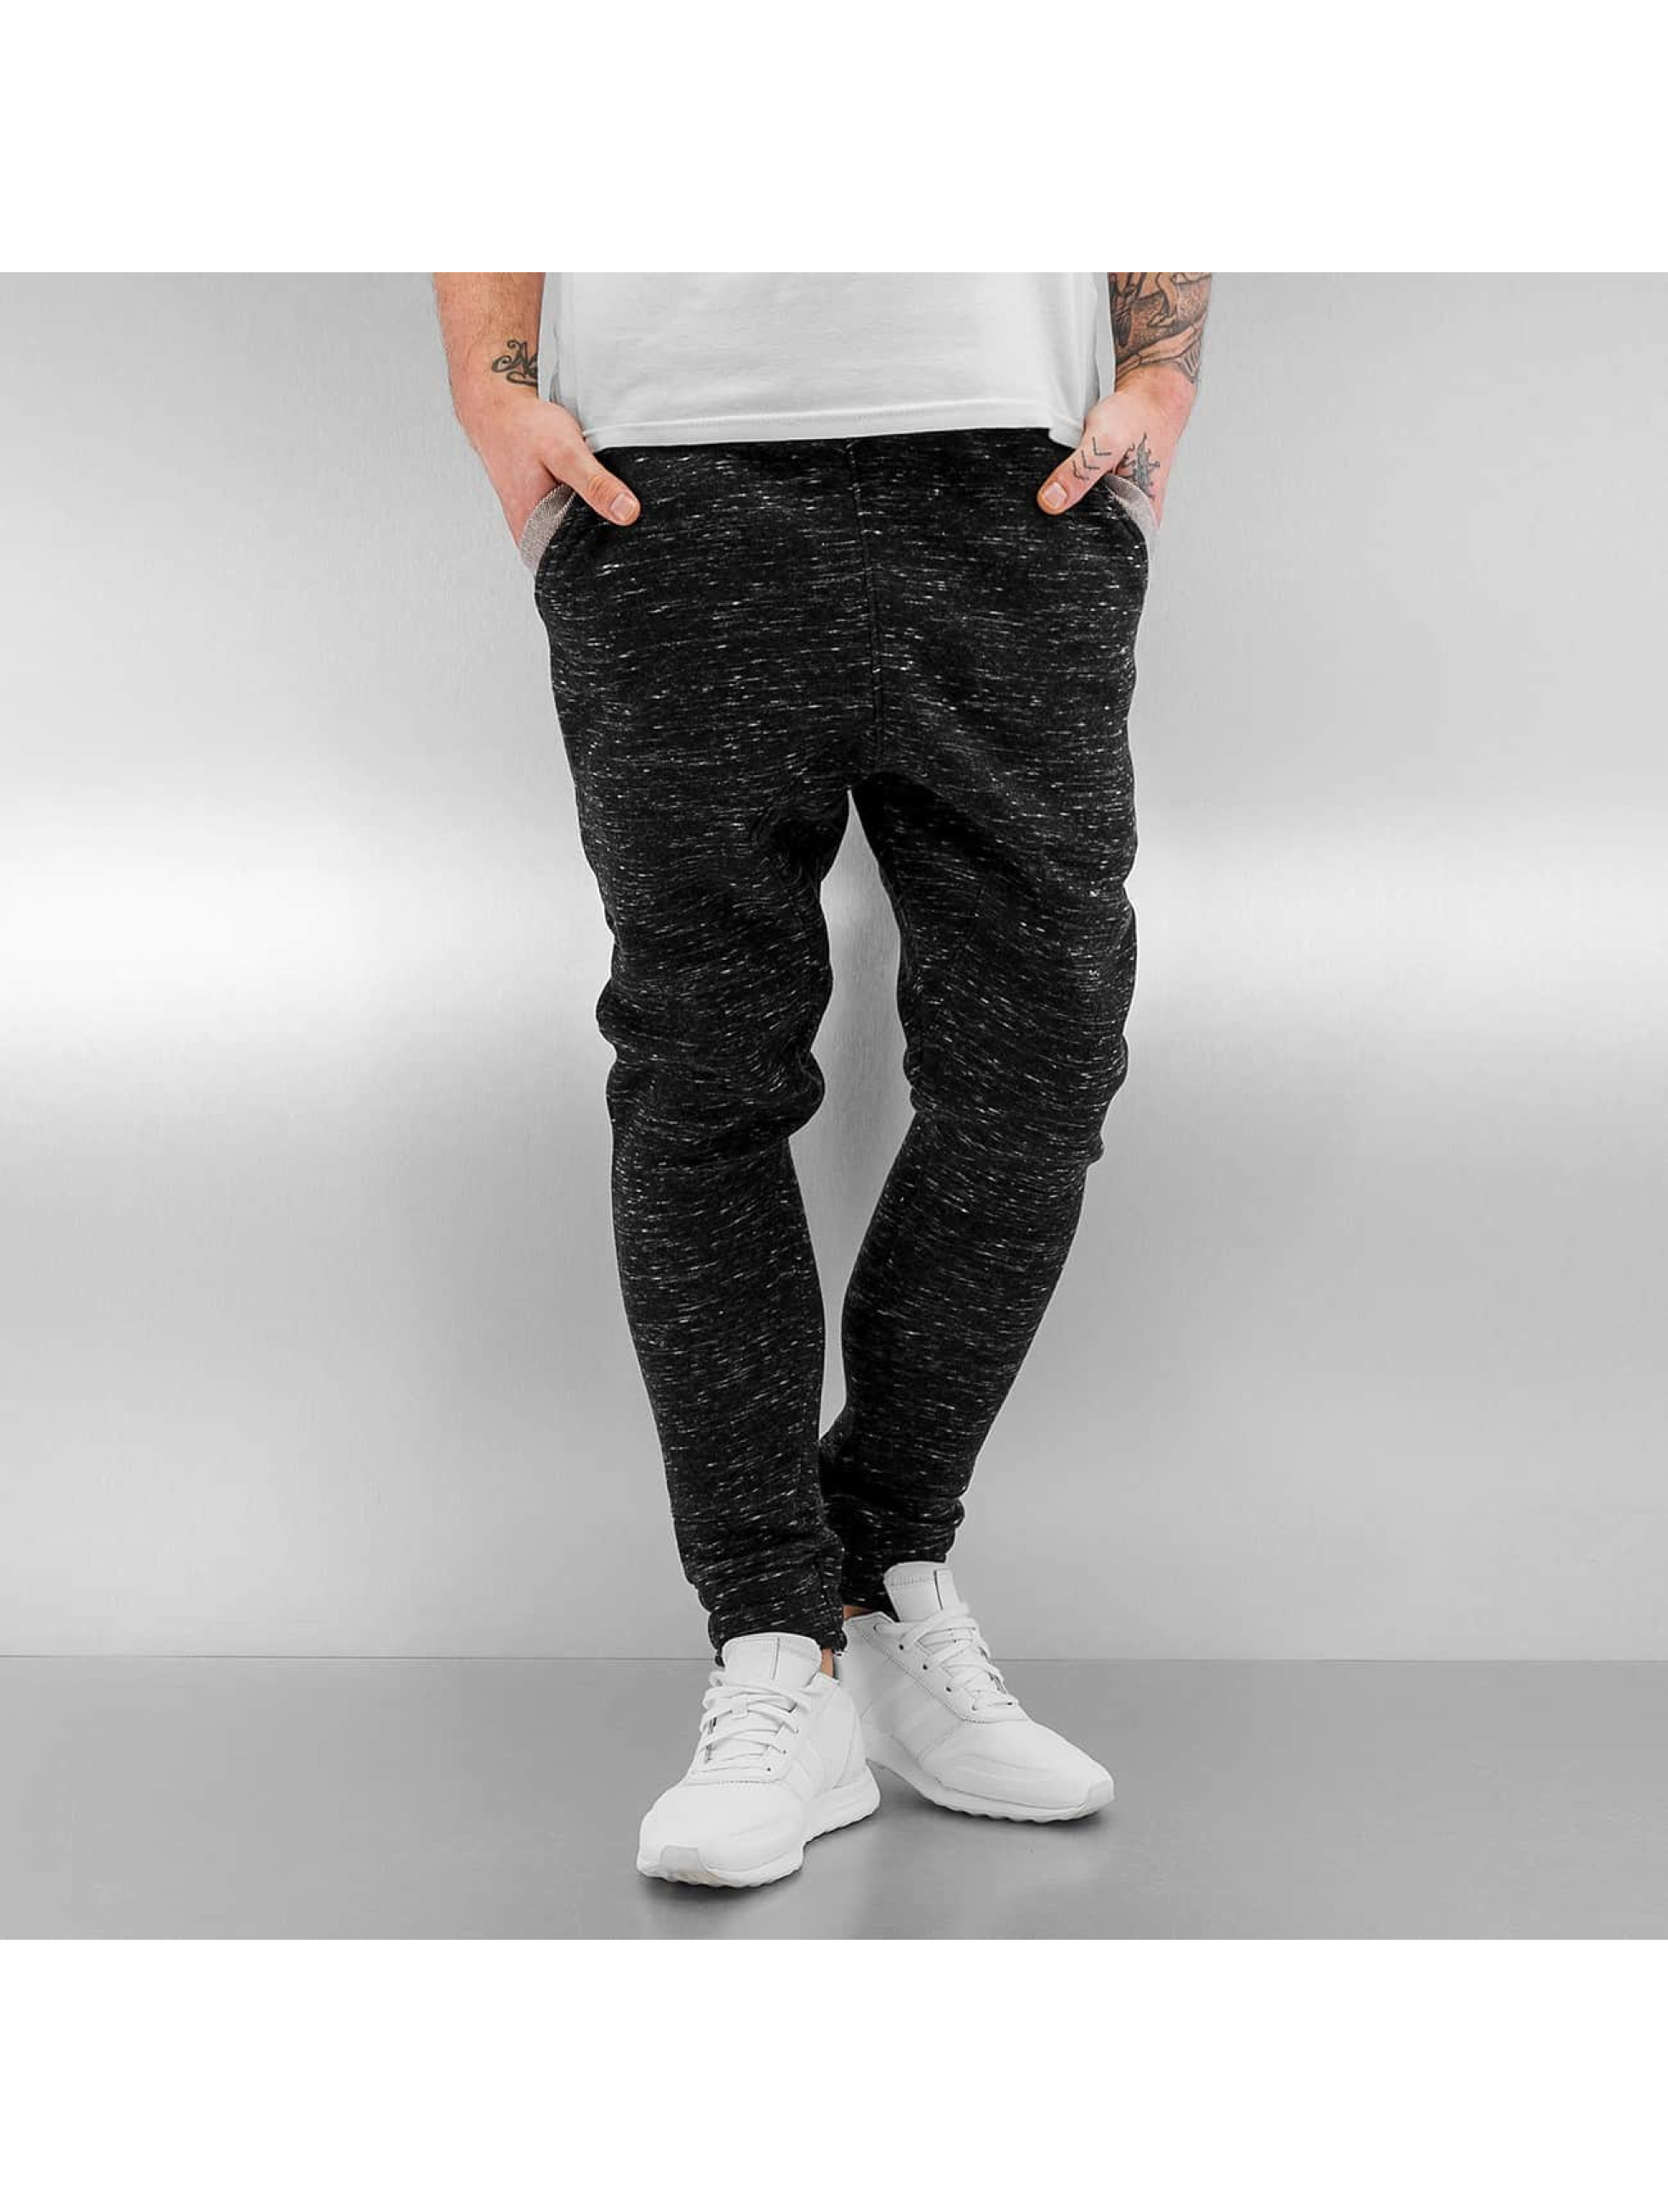 Just Rhyse / Sweat Pant Manzanita in black 2XL